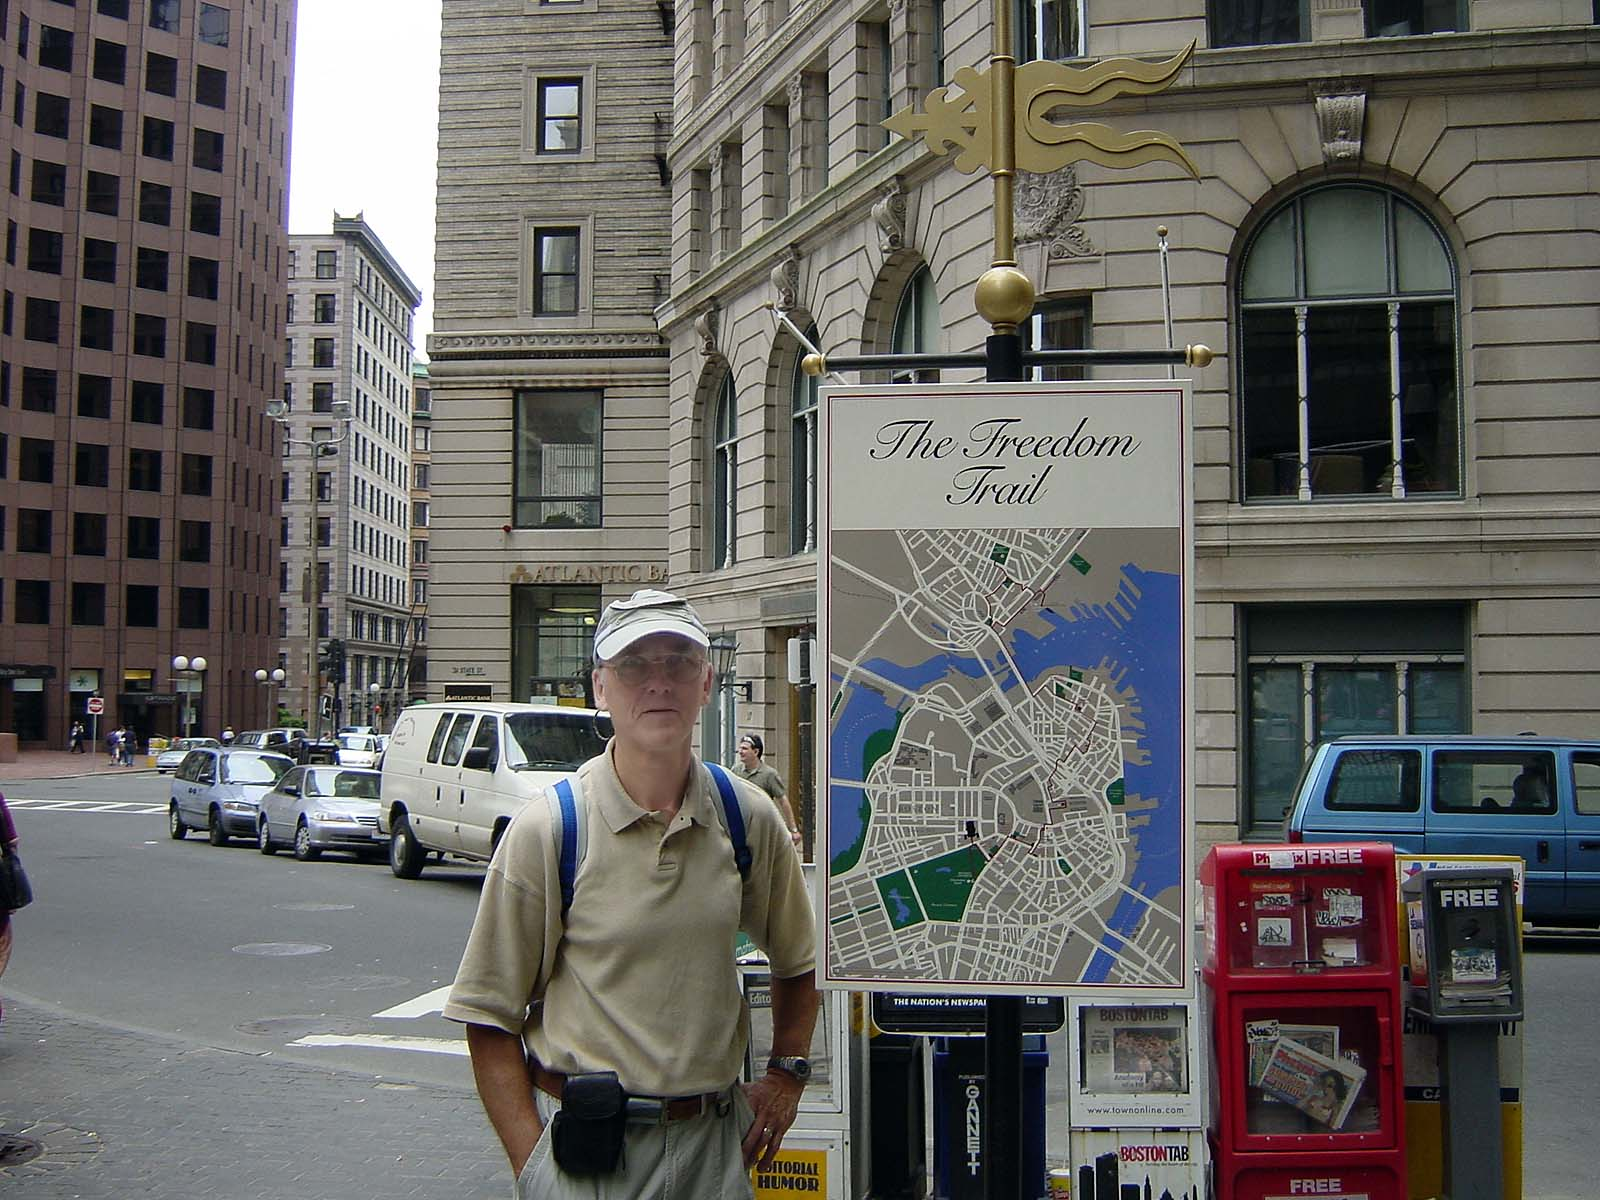 Boston - The Freedom Trail